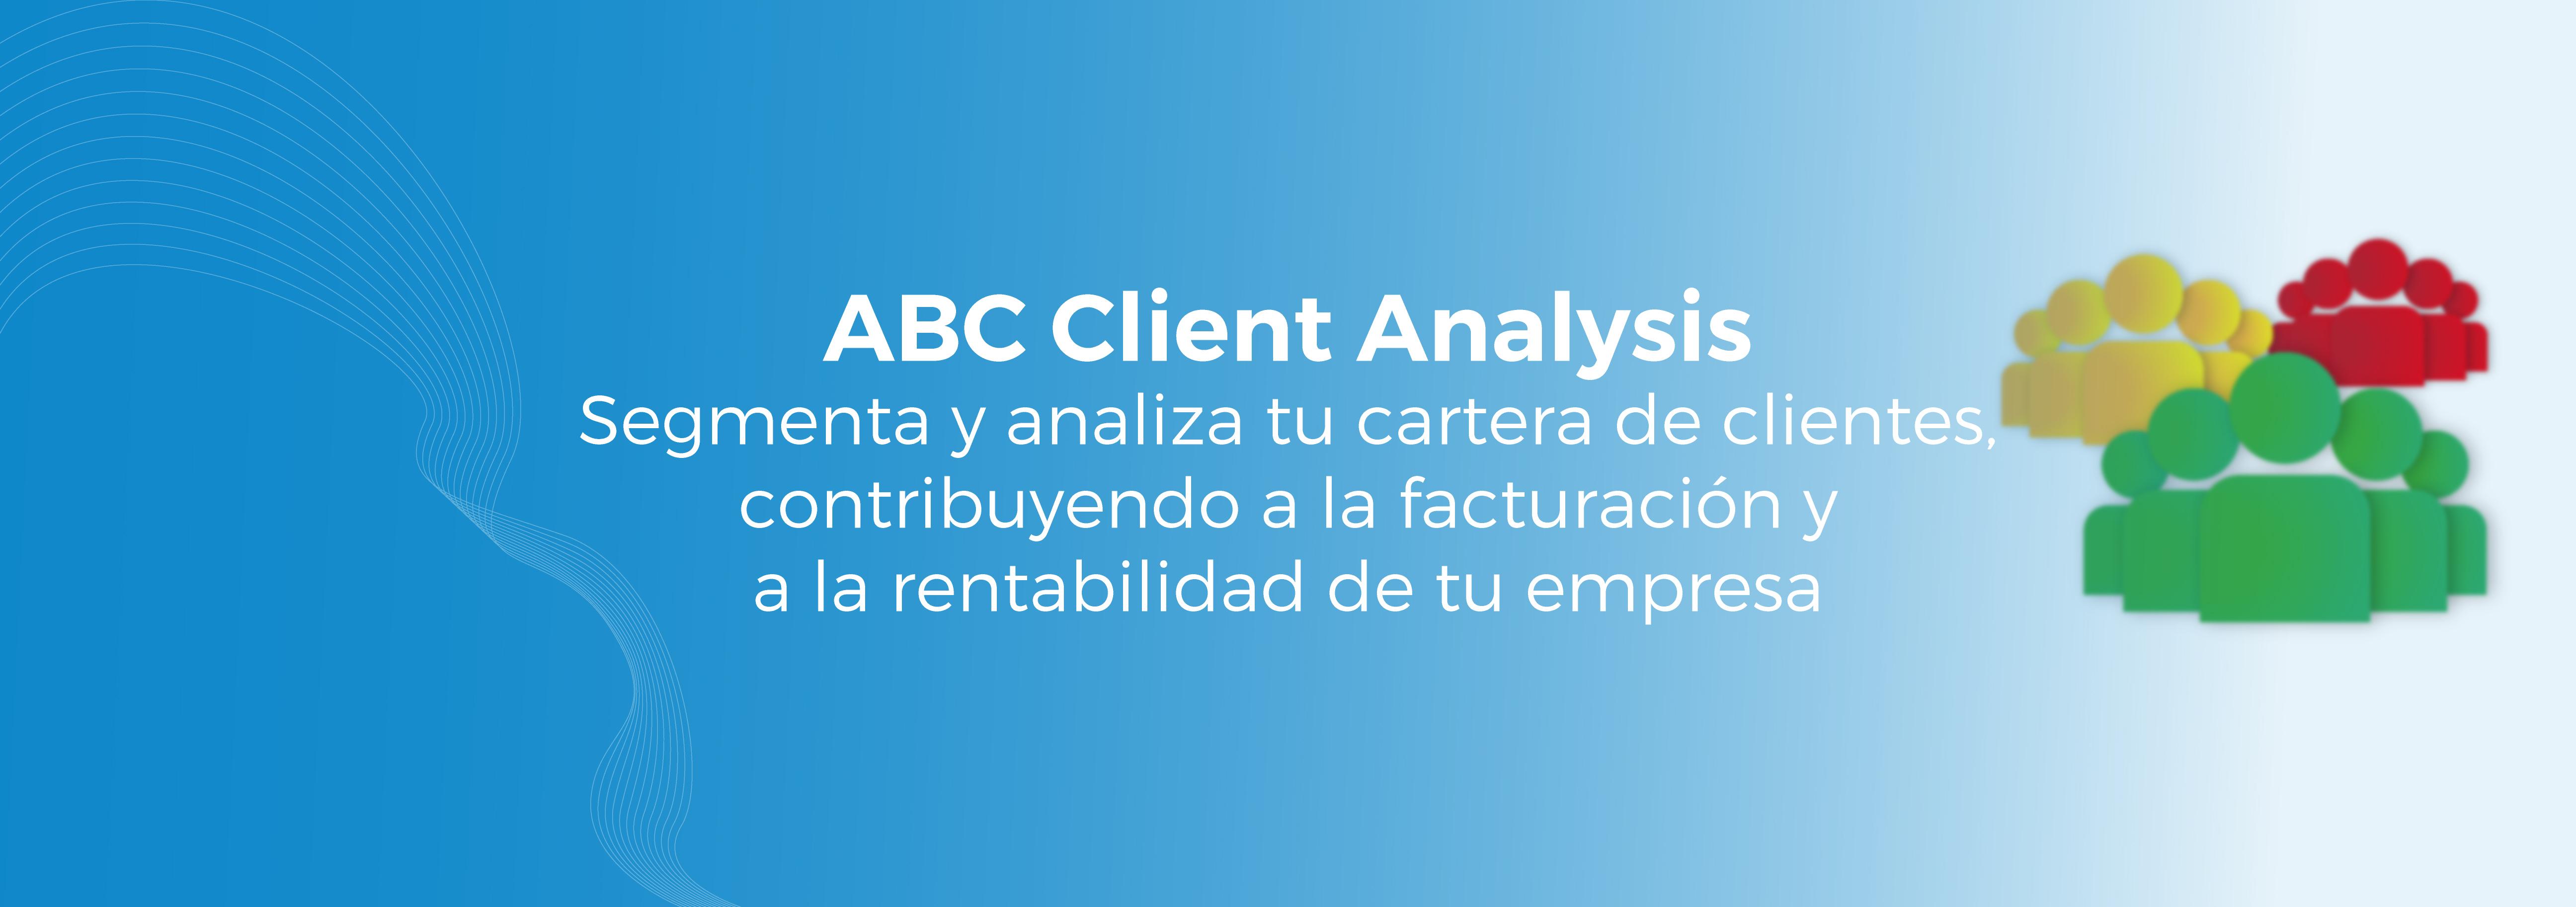 ABC-Portada-Landing (1)